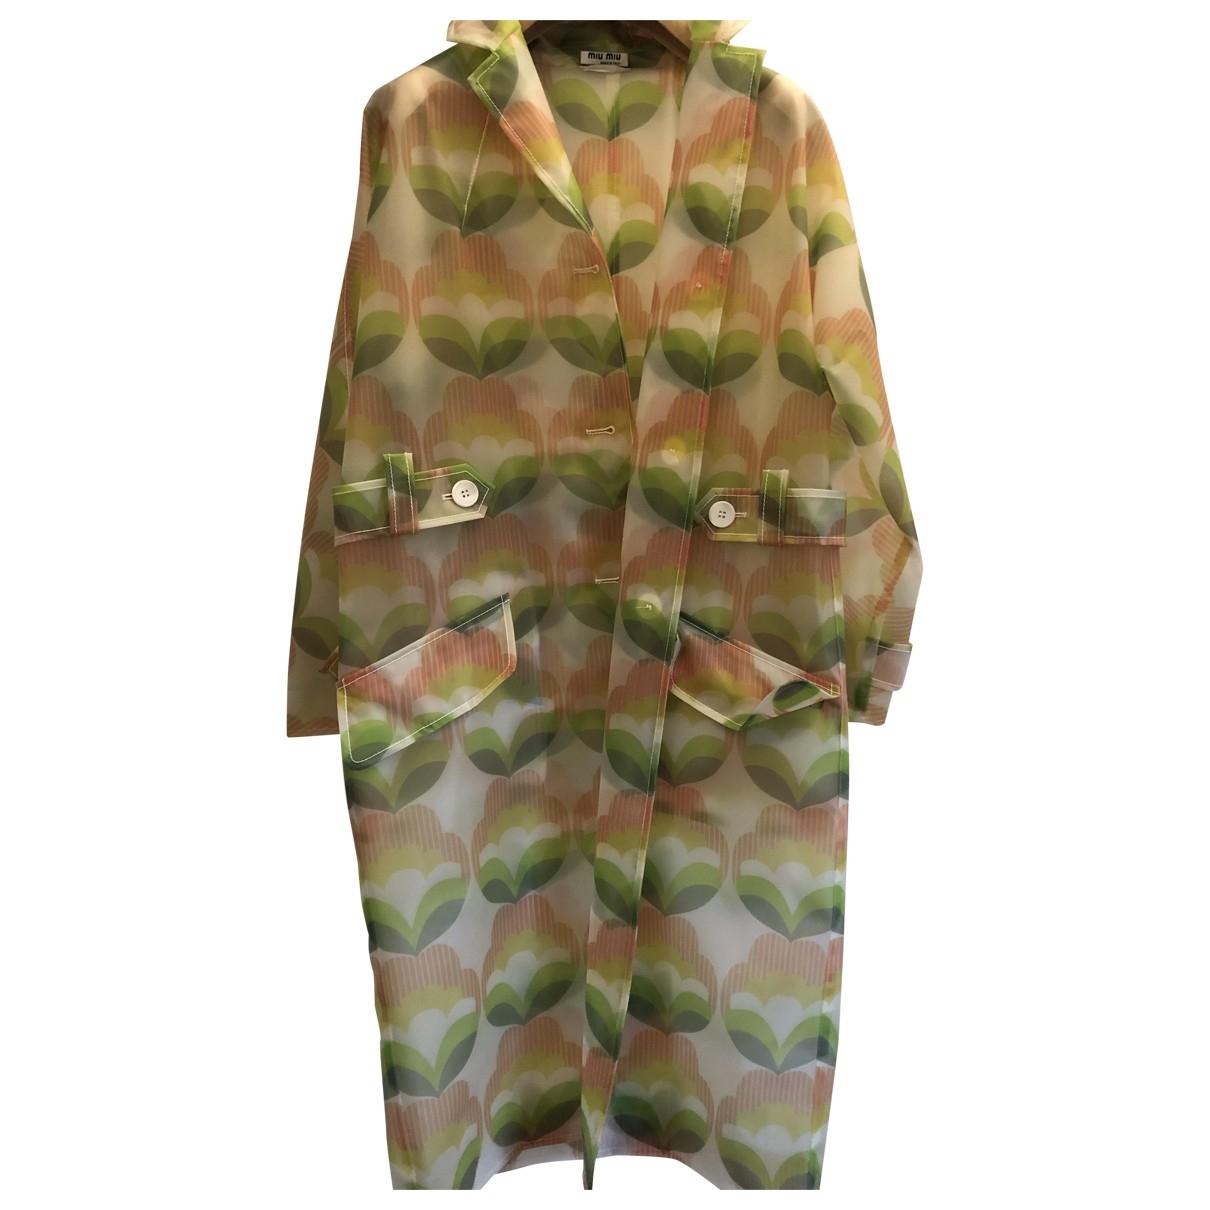 Miu Miu \N Multicolour Trench coat for Women 36 IT